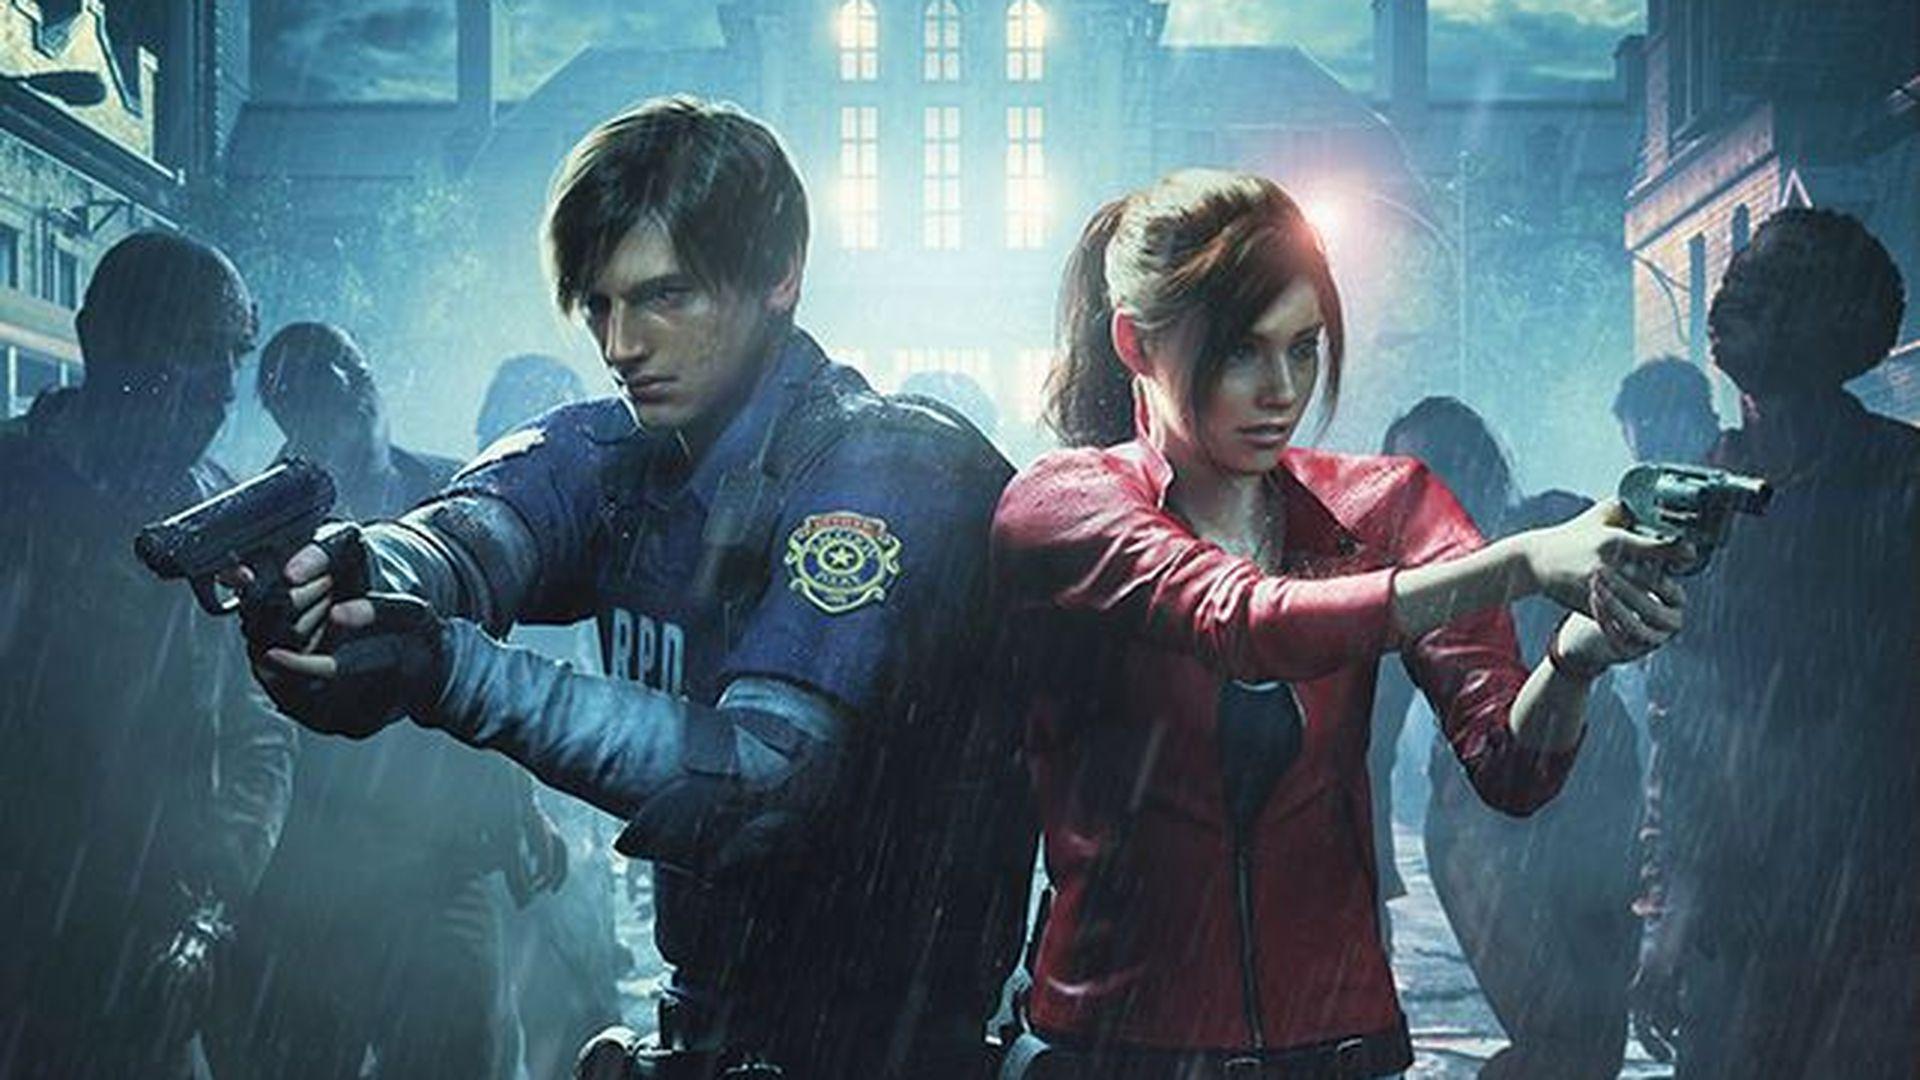 Resident Evil 2 Remake Wallpapers Wallpaper Cave